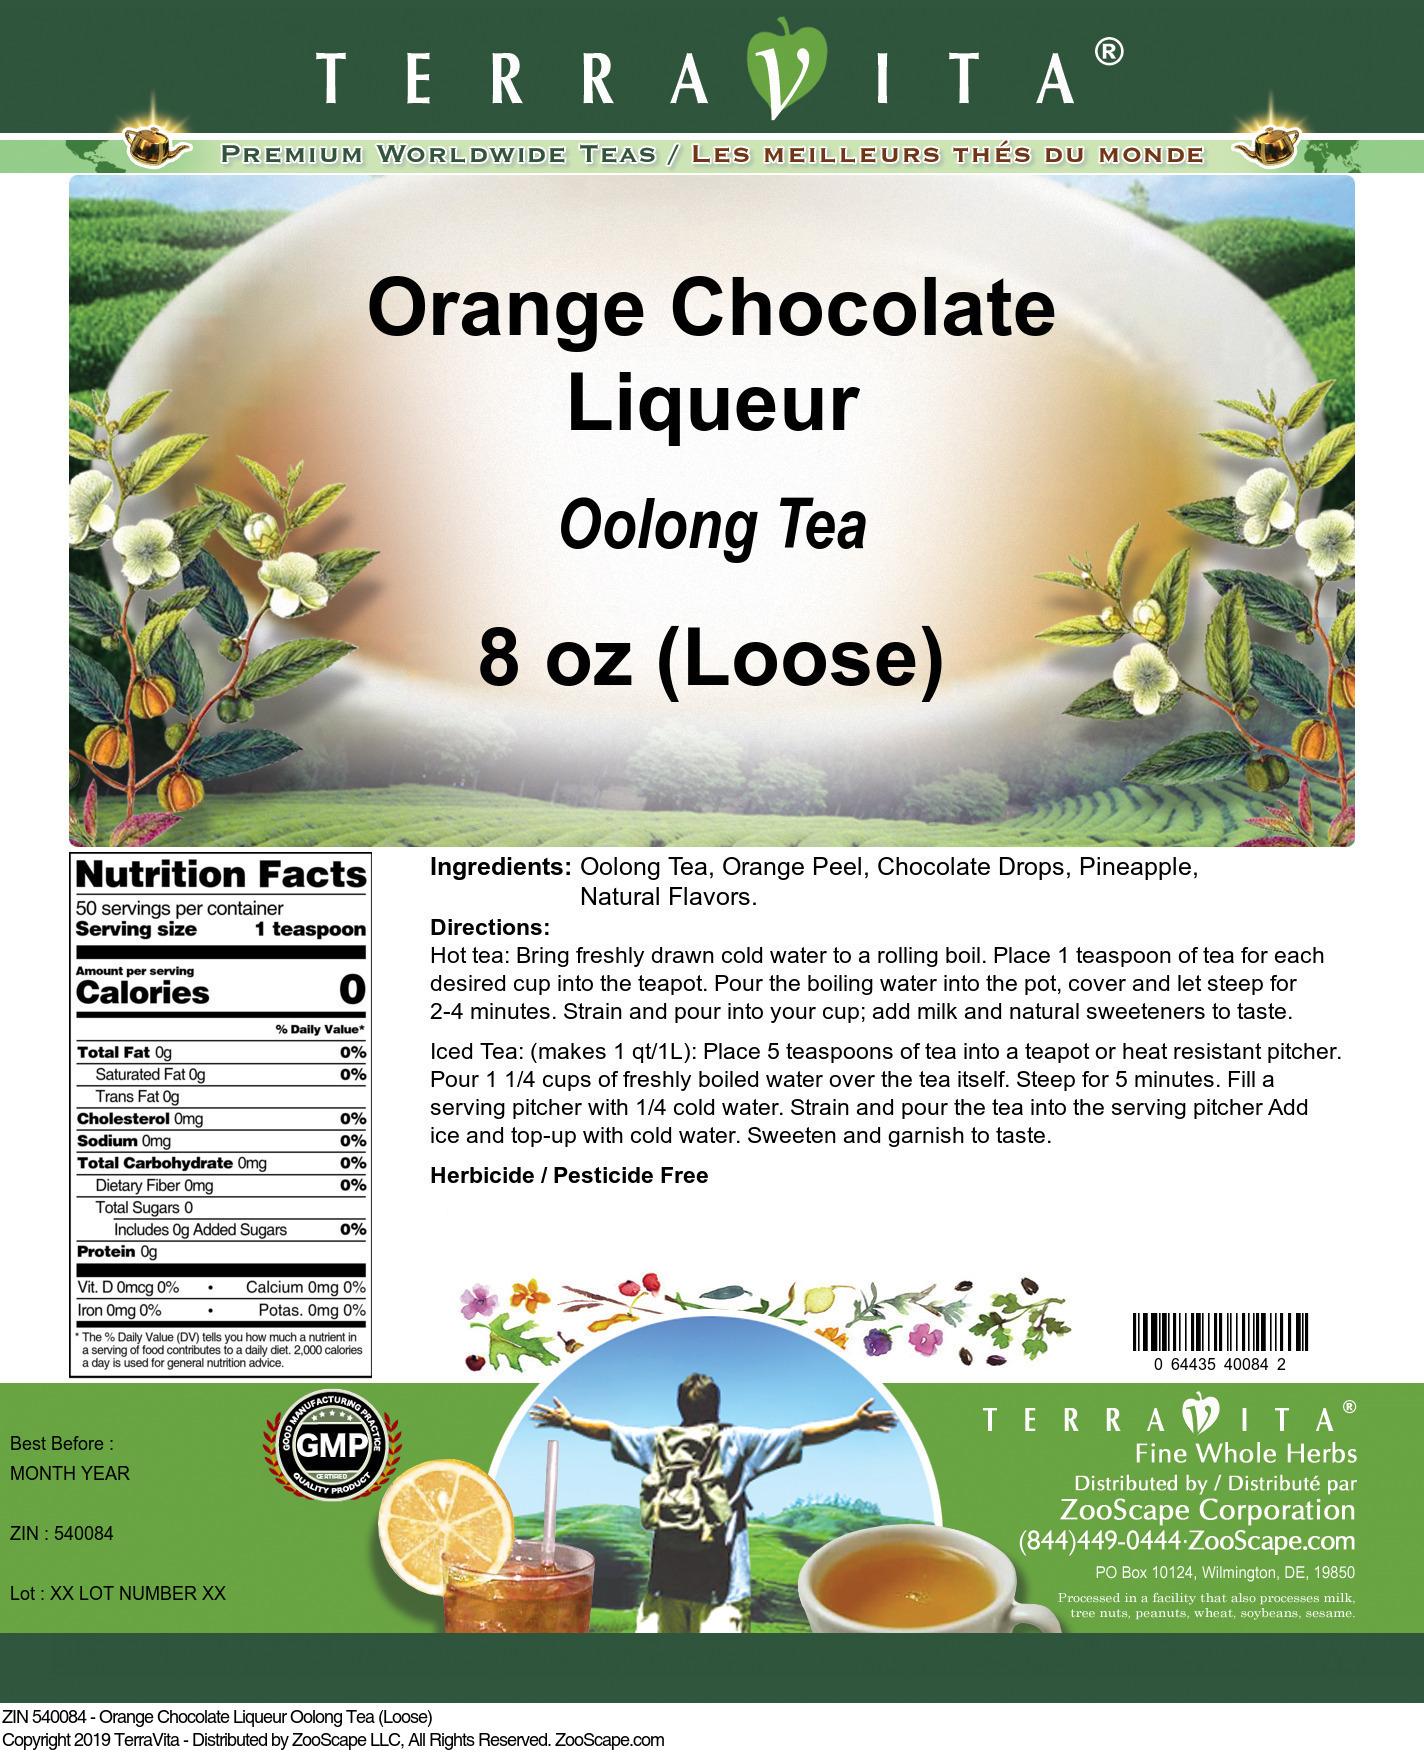 Orange Chocolate Liqueur Oolong Tea